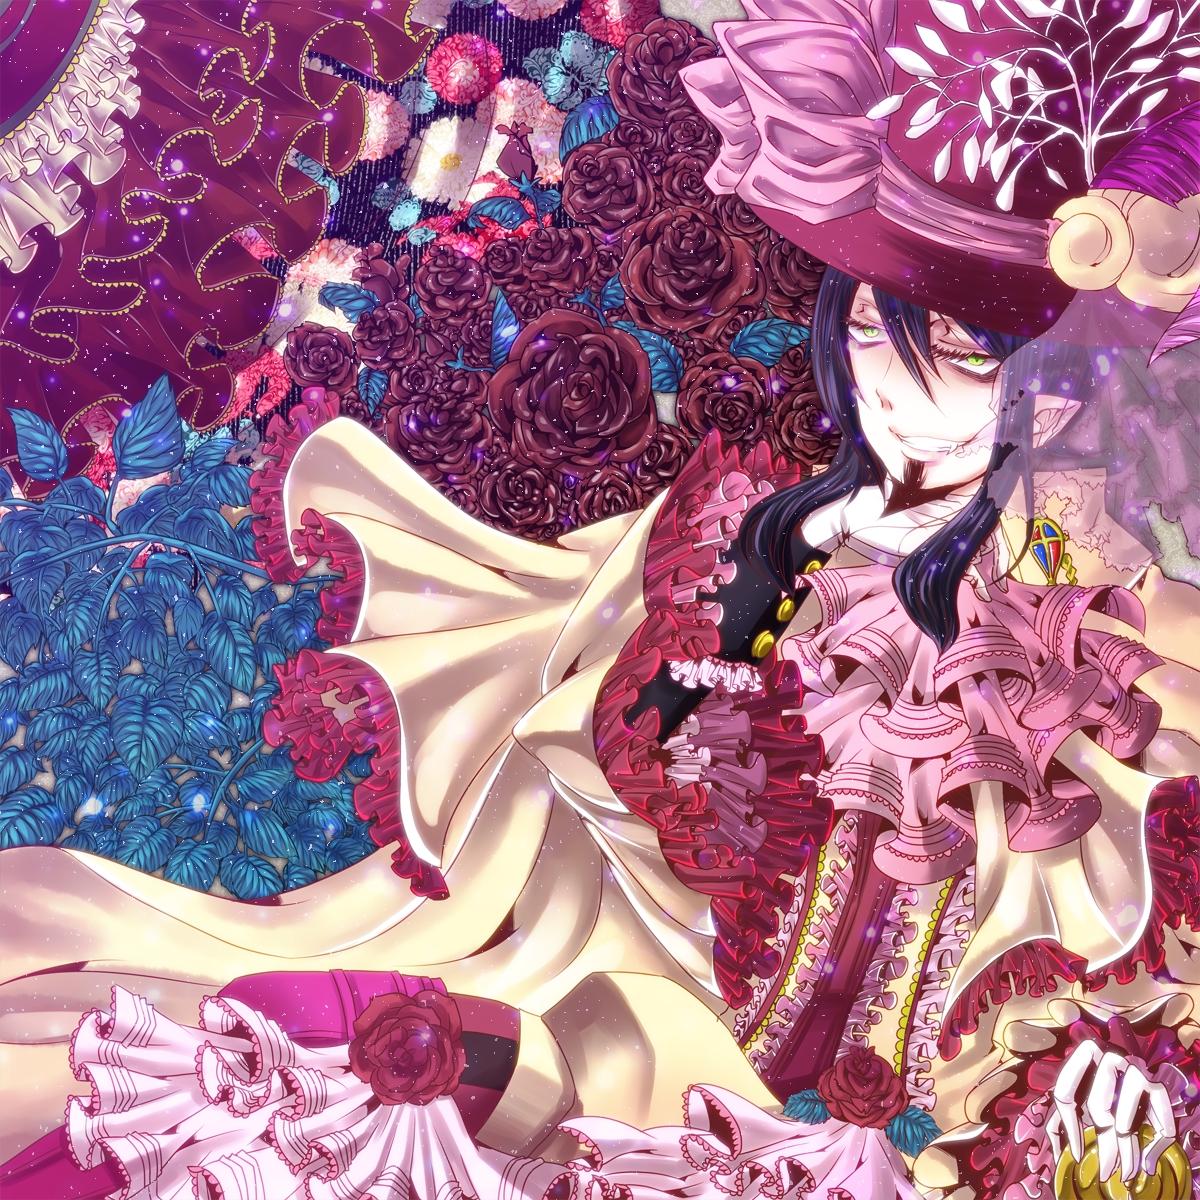 Mephisto pheles wallpaper